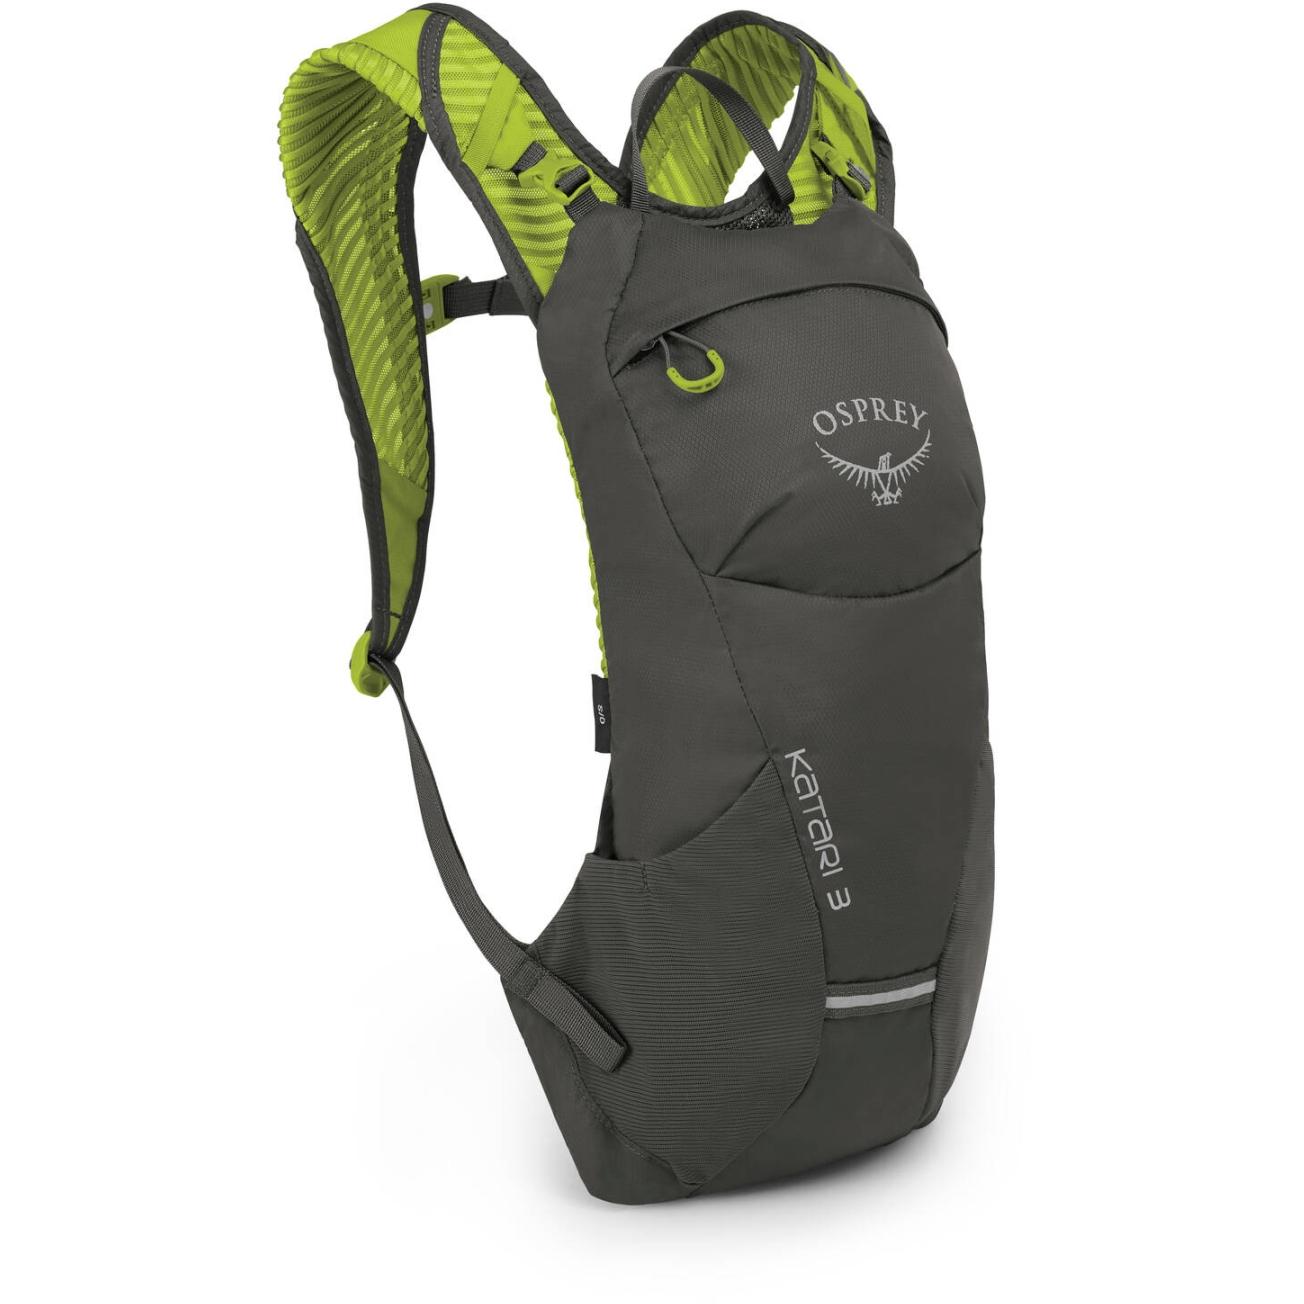 Osprey Katari 3 Hydration Backpack - Lime Stone